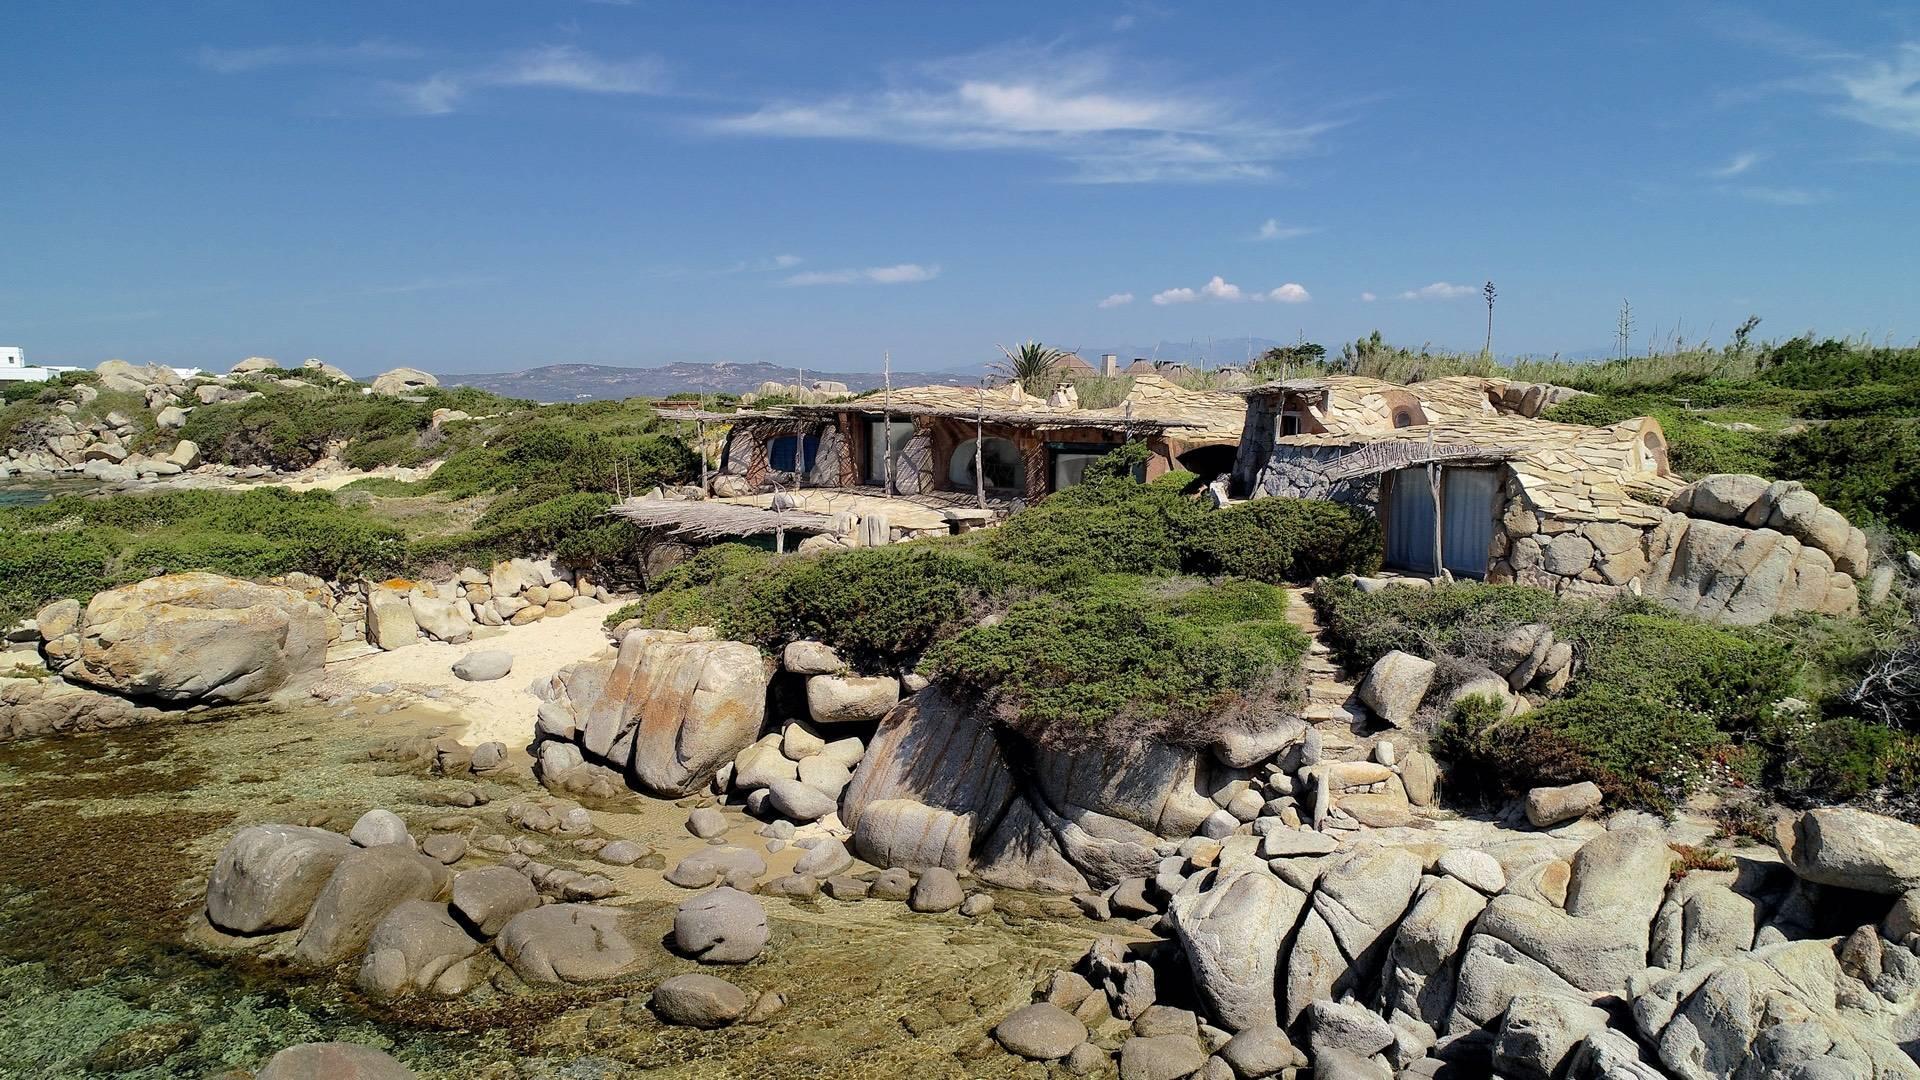 Iconica villa pieds dans l'eau all'ile de Cavallo - 2